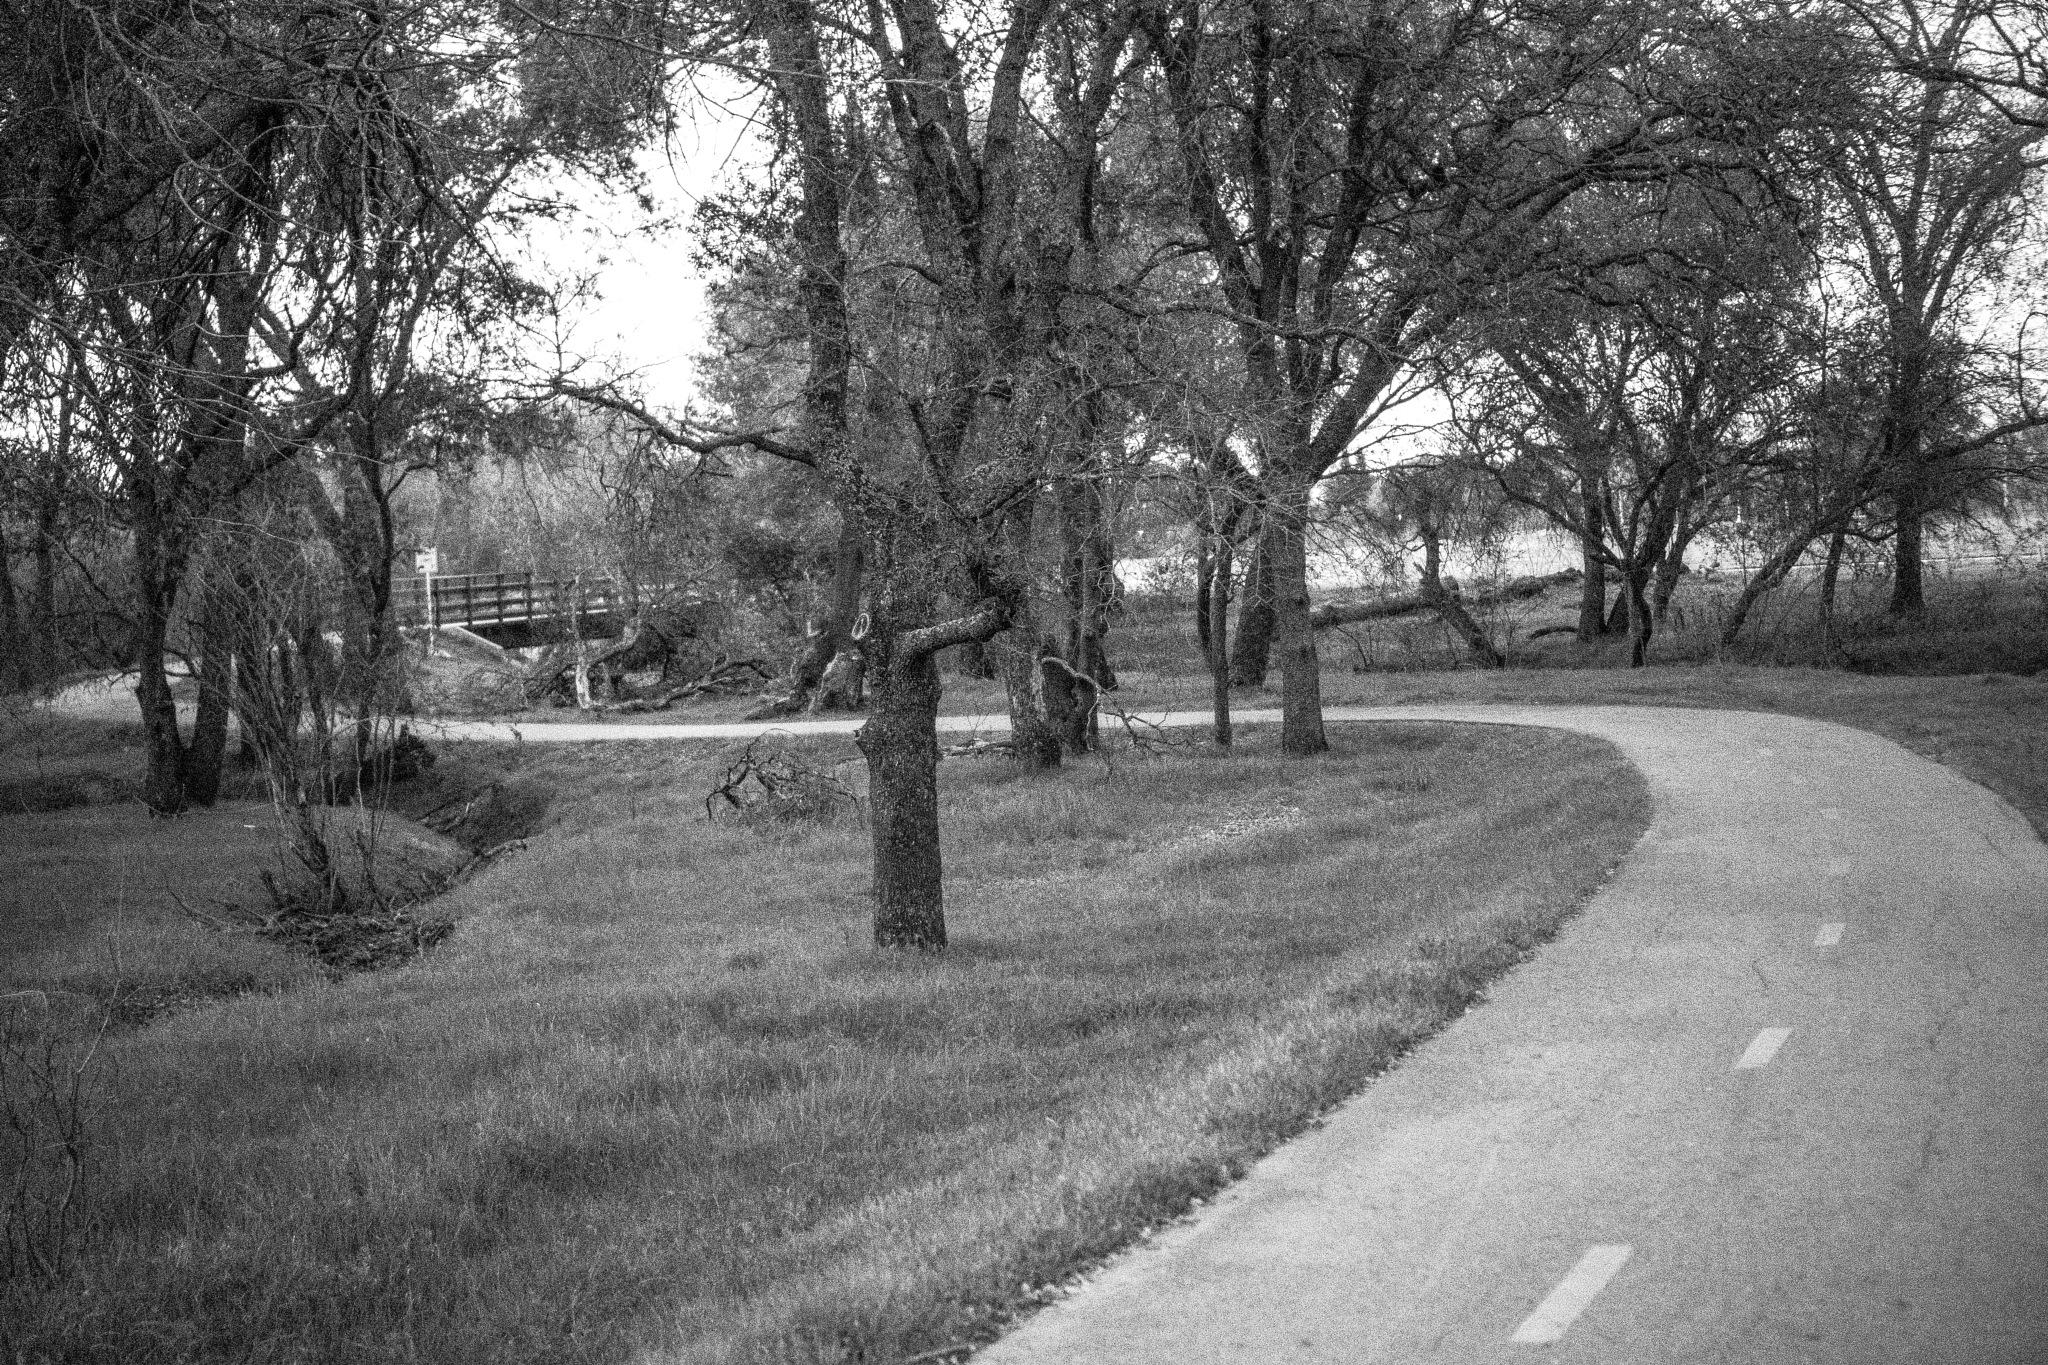 Bike Trail by James Hicks